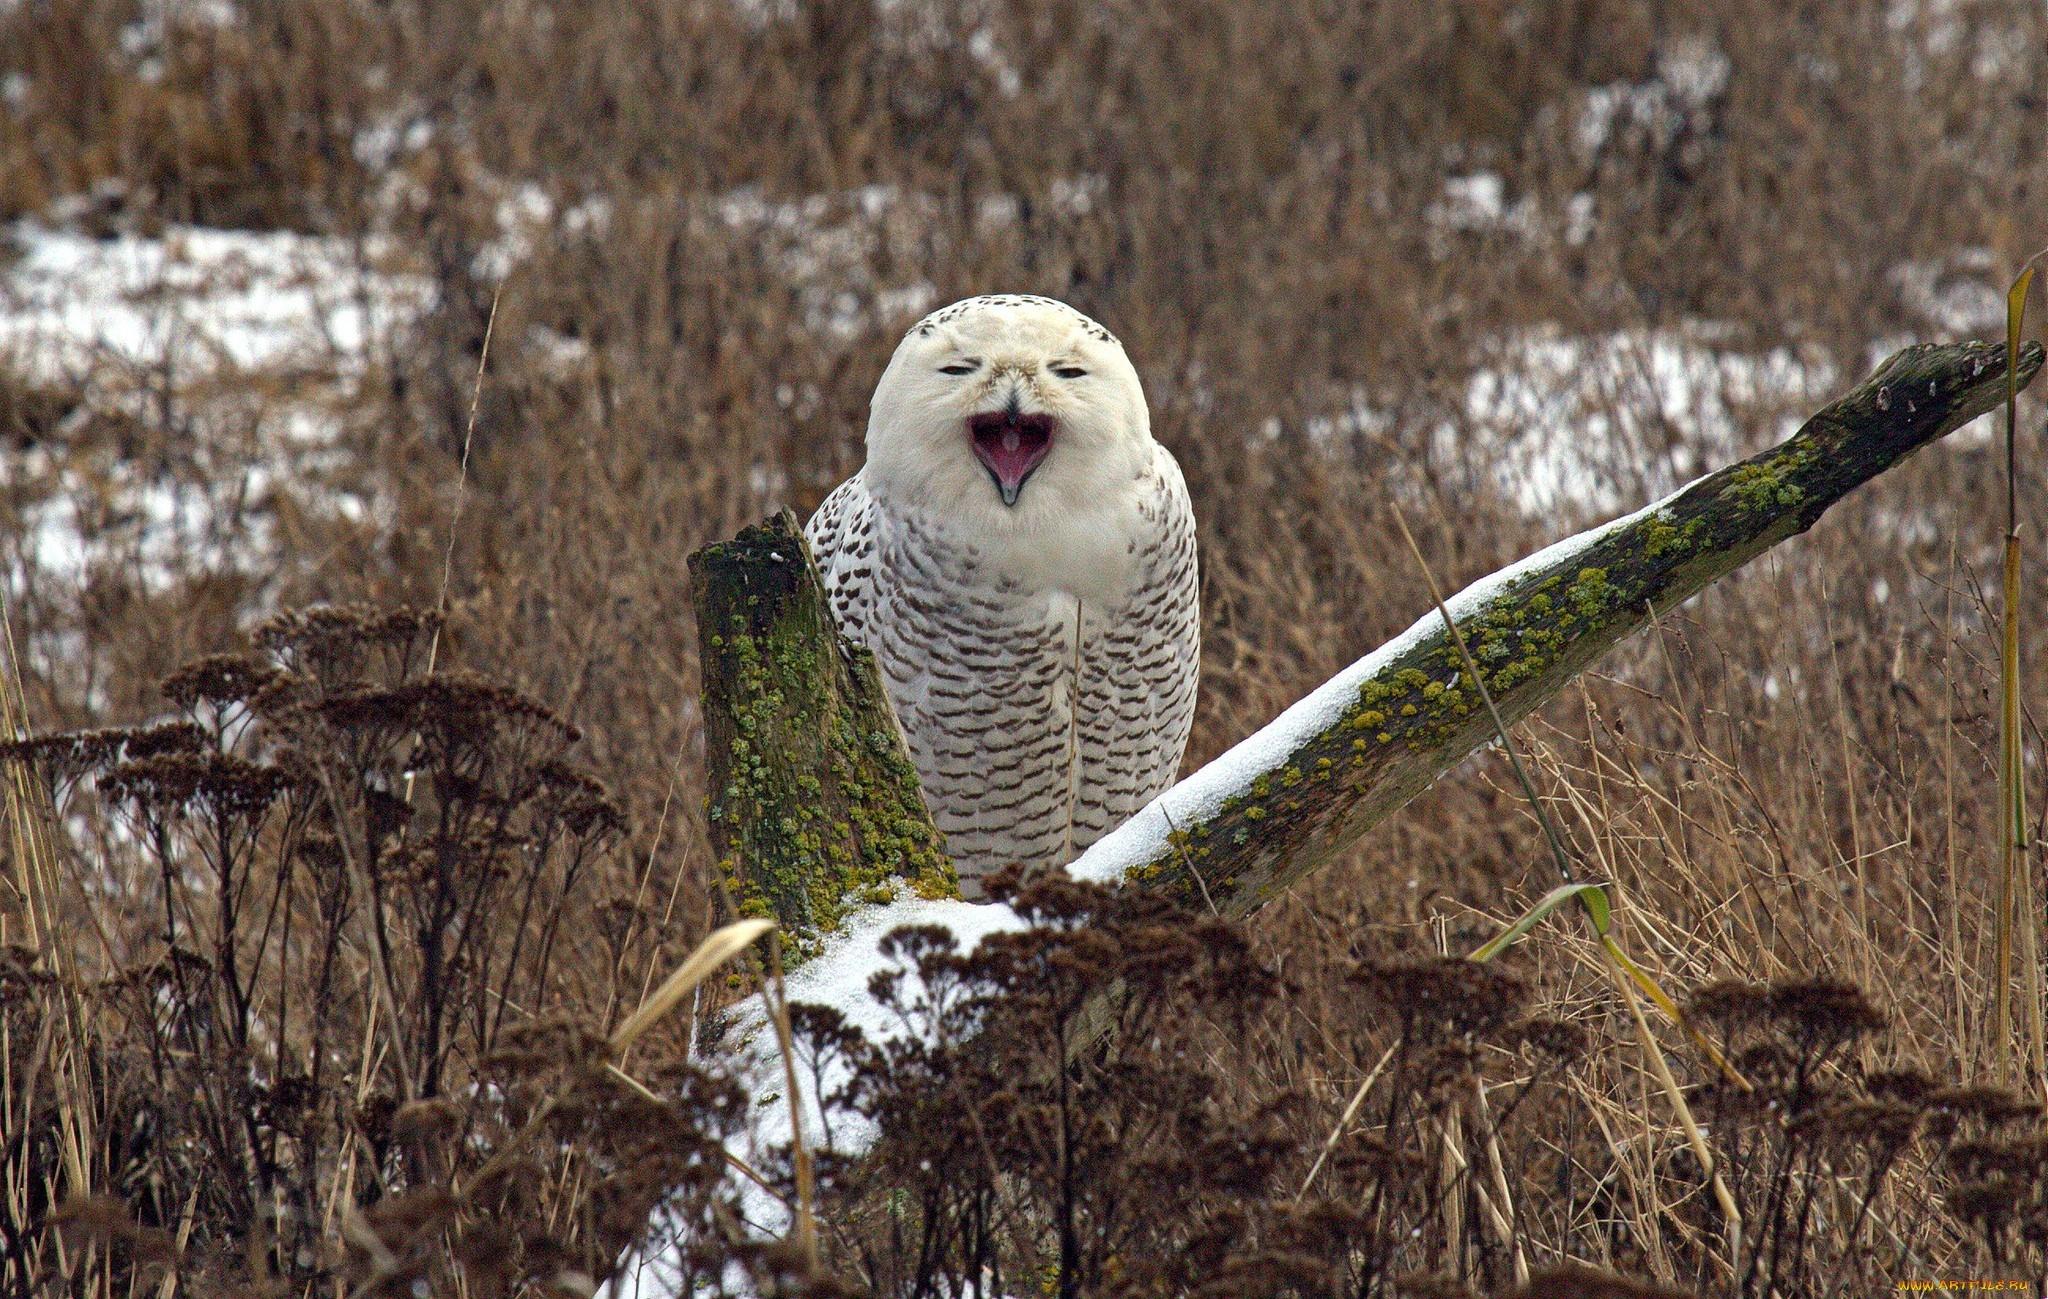 Adorable Snowy Owl Desktop Background. Download …